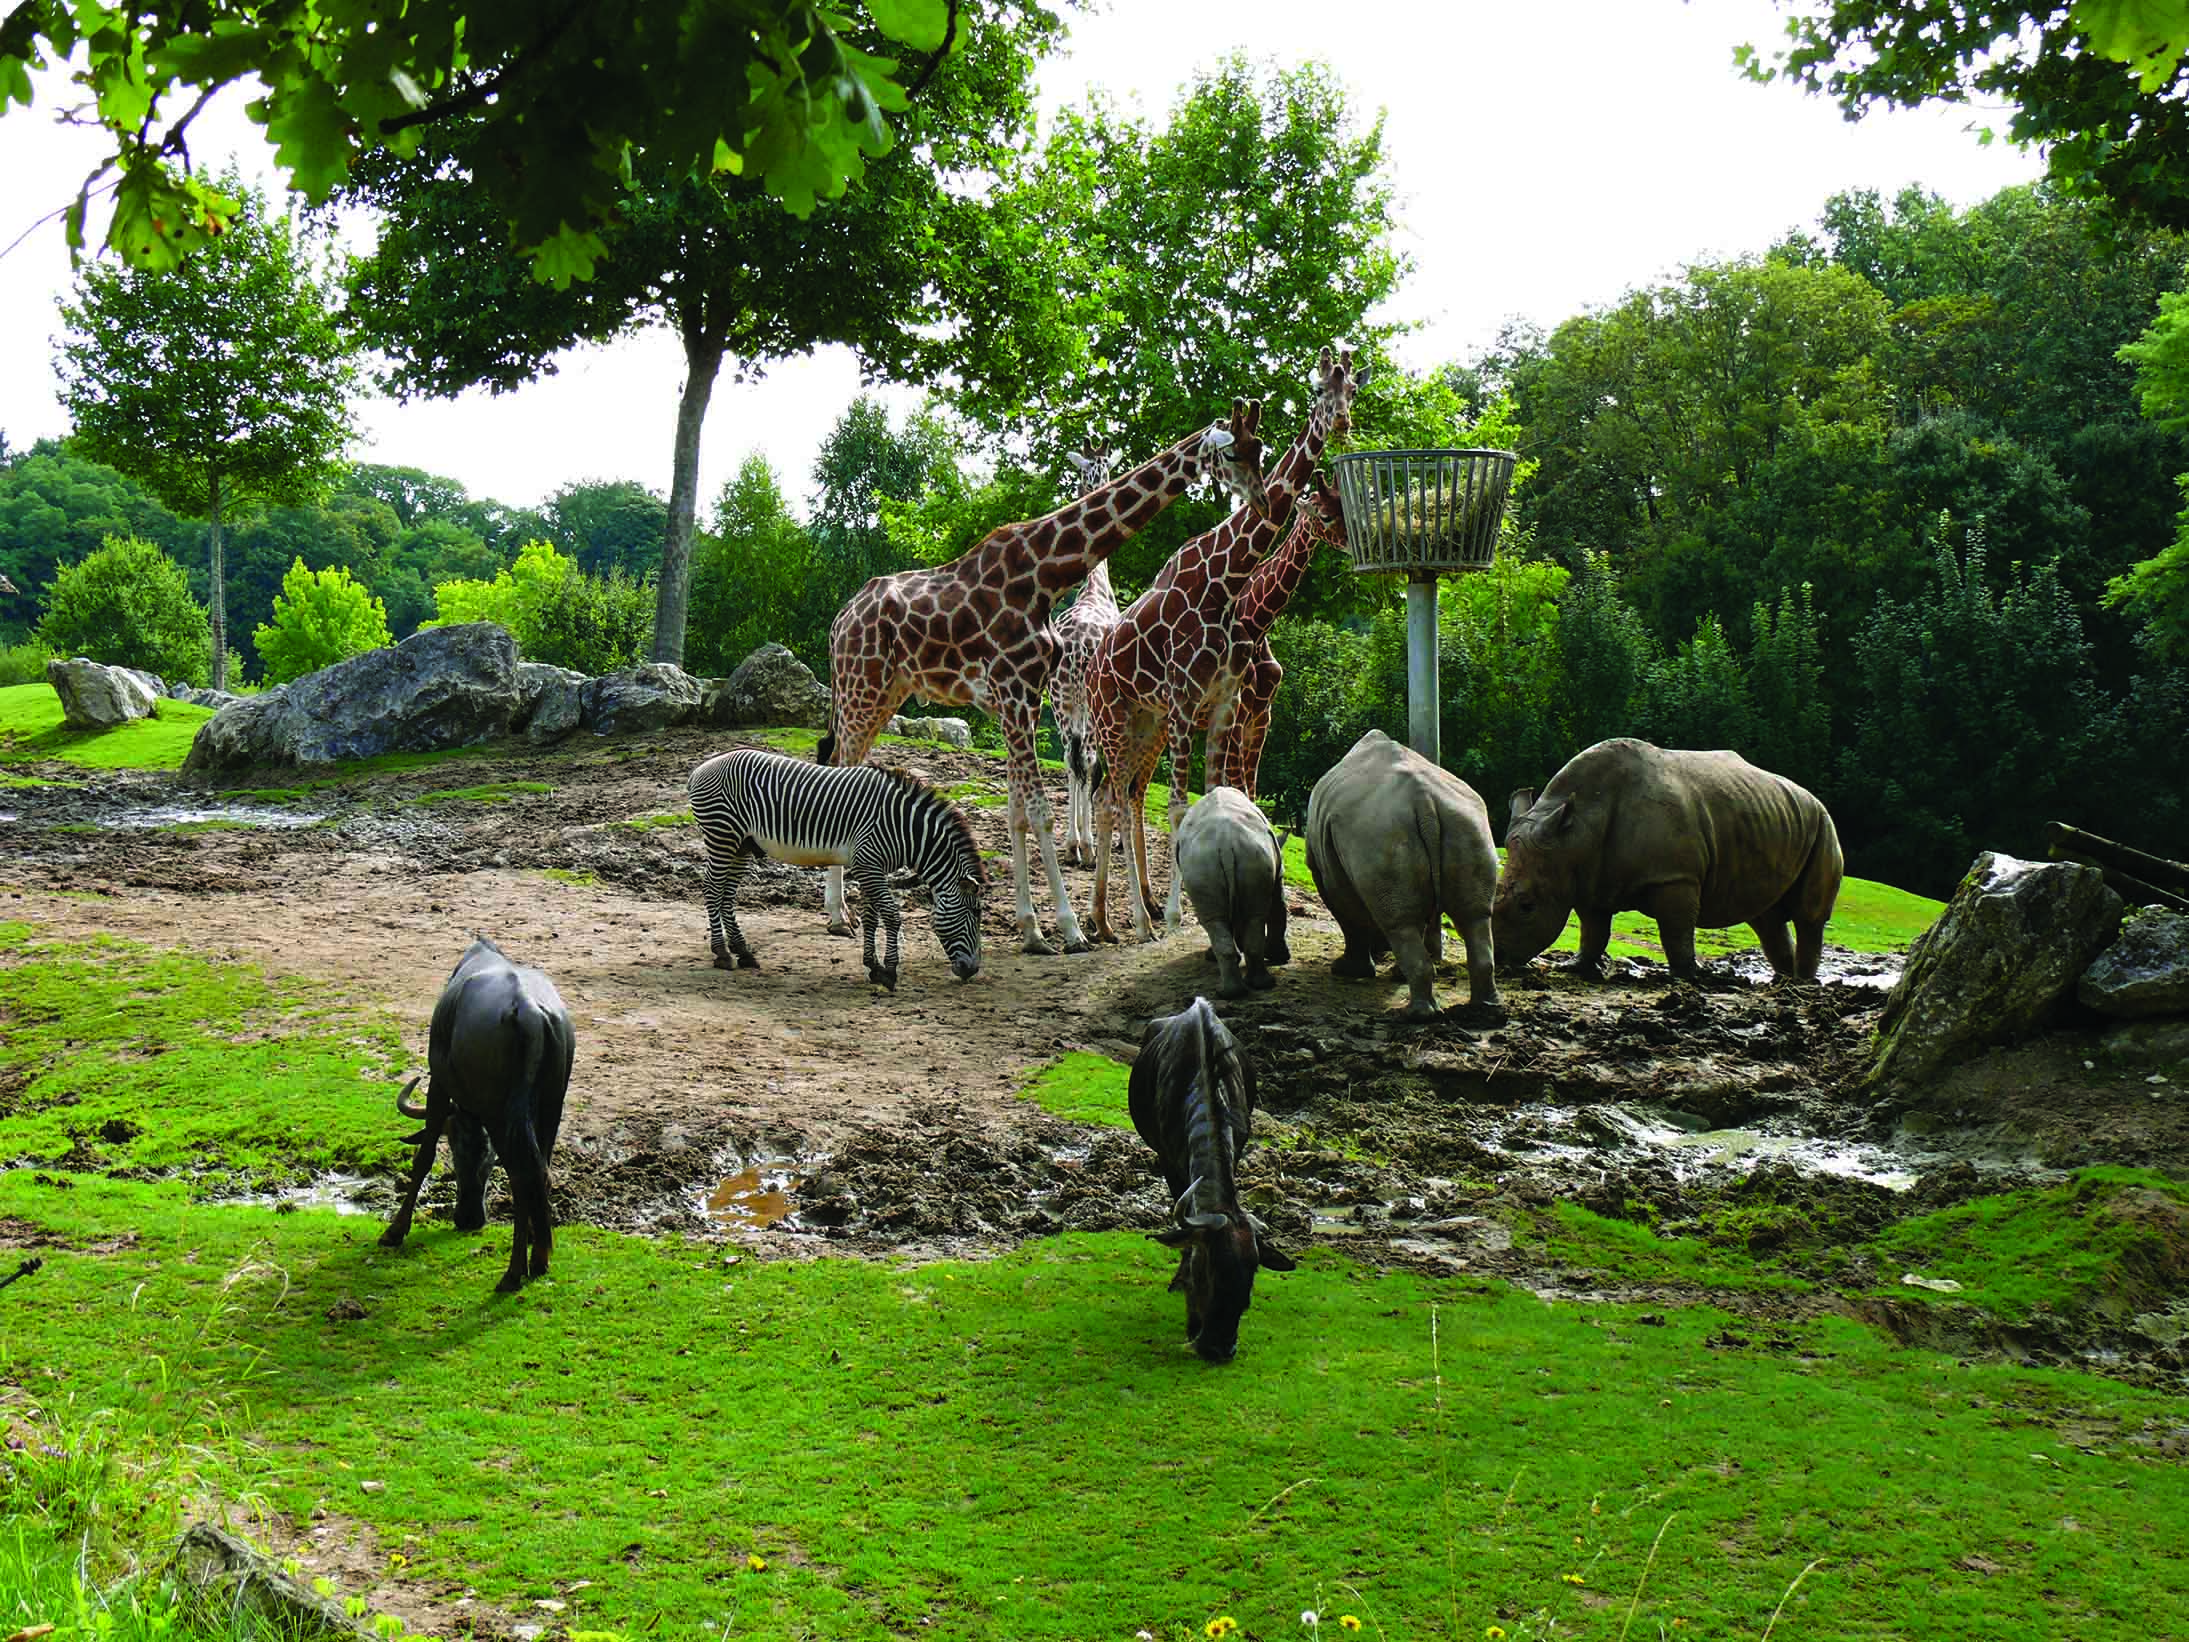 Zoo-Parc-de-Beauval-France-Savana-Animals